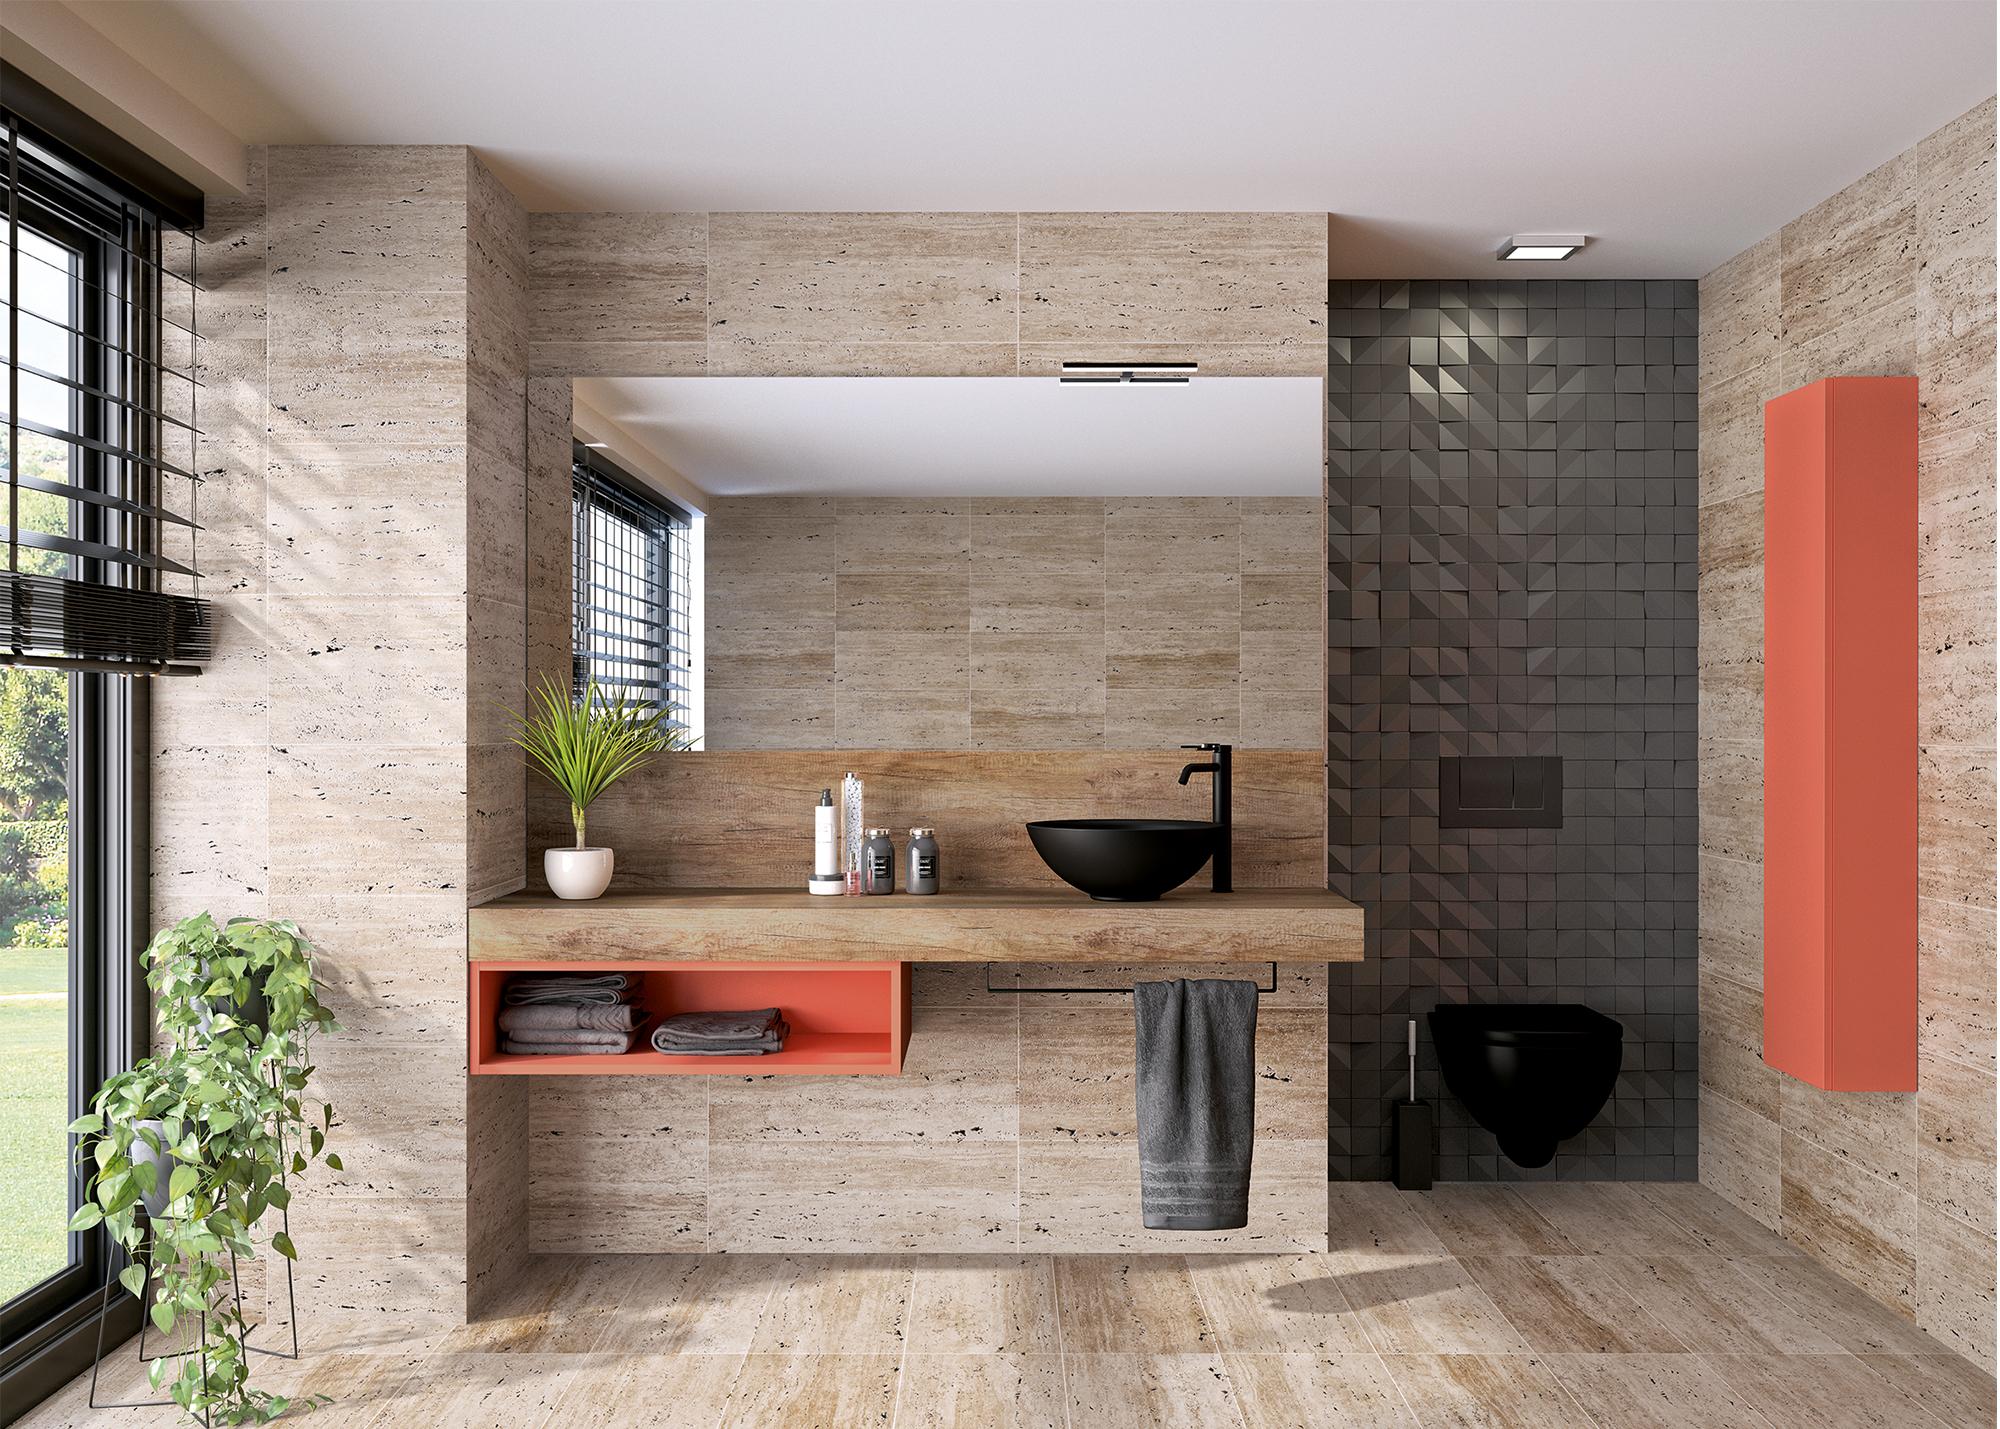 Extenso | Meubles de salle de bains, baignoires, fabricant français ...